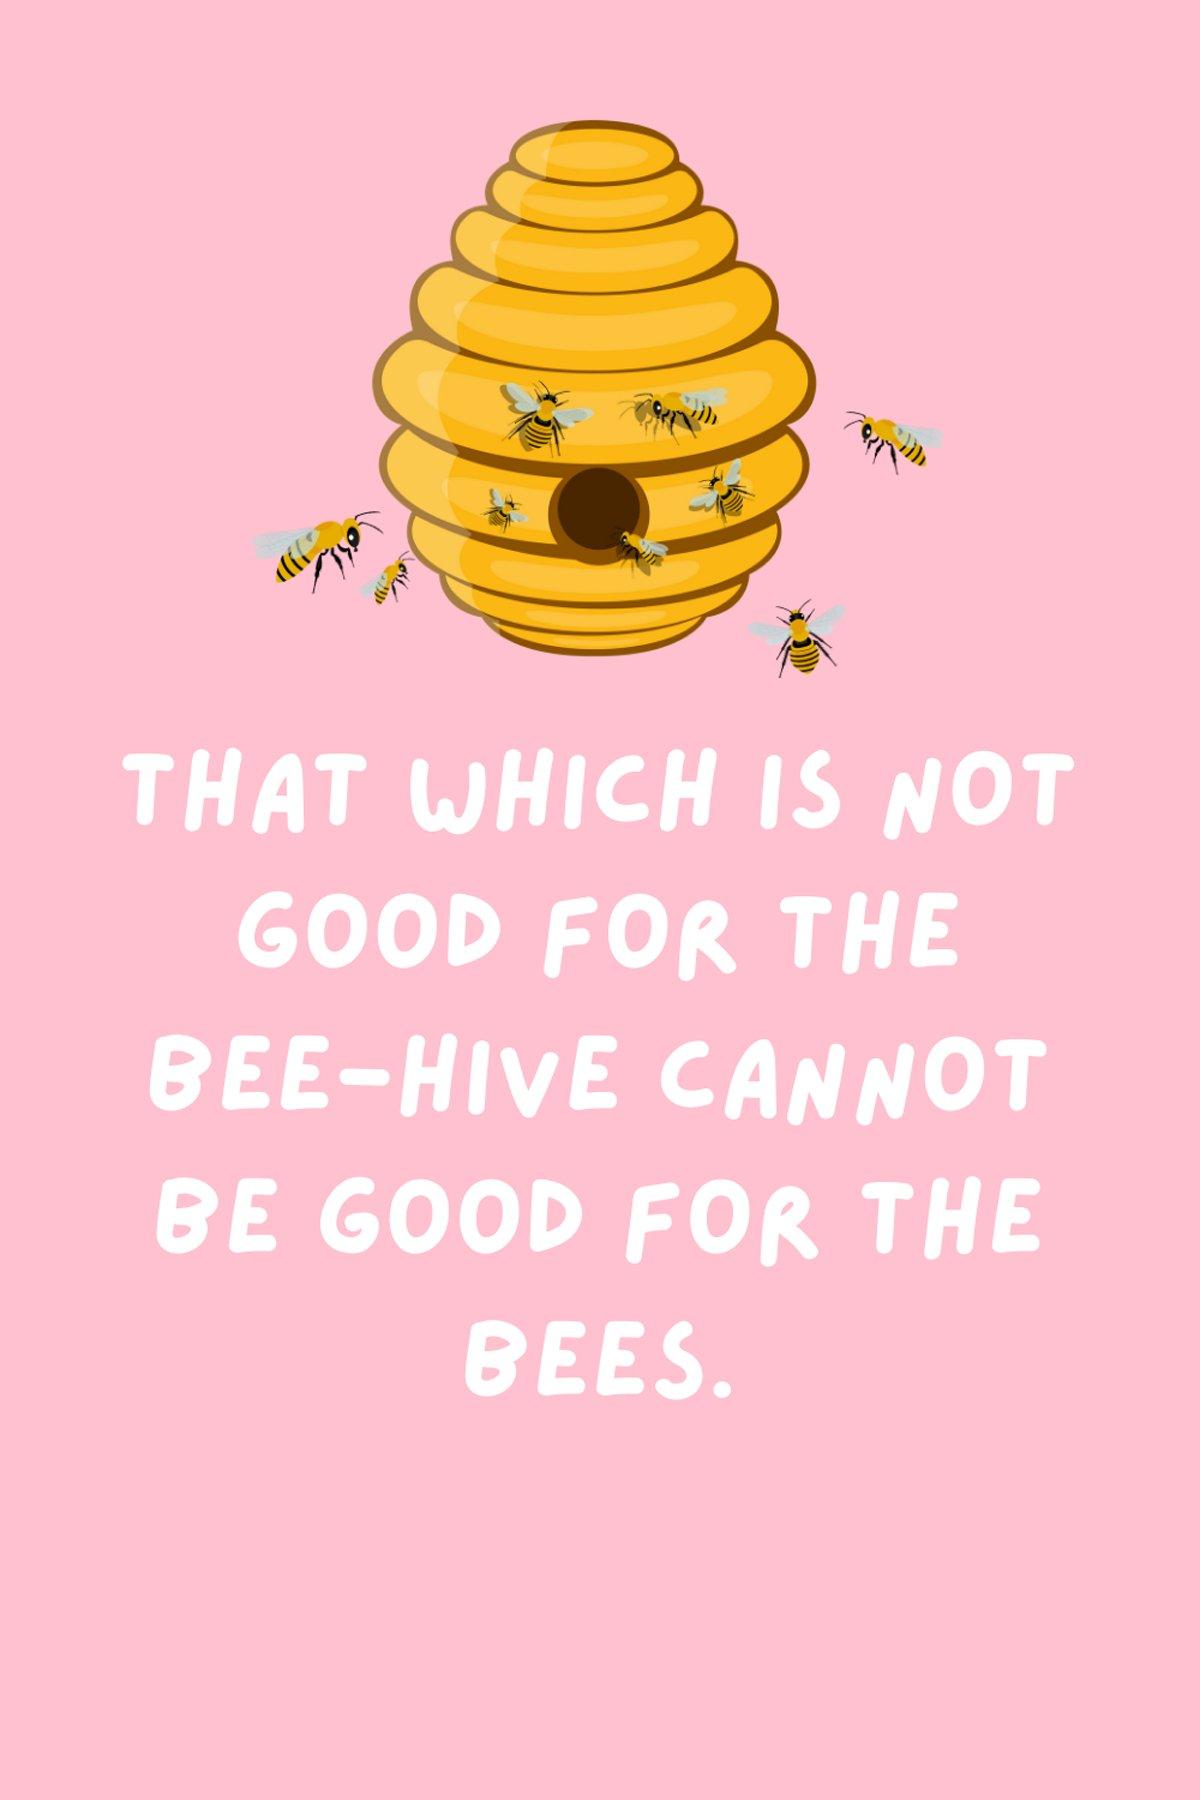 Hive quotes Captions